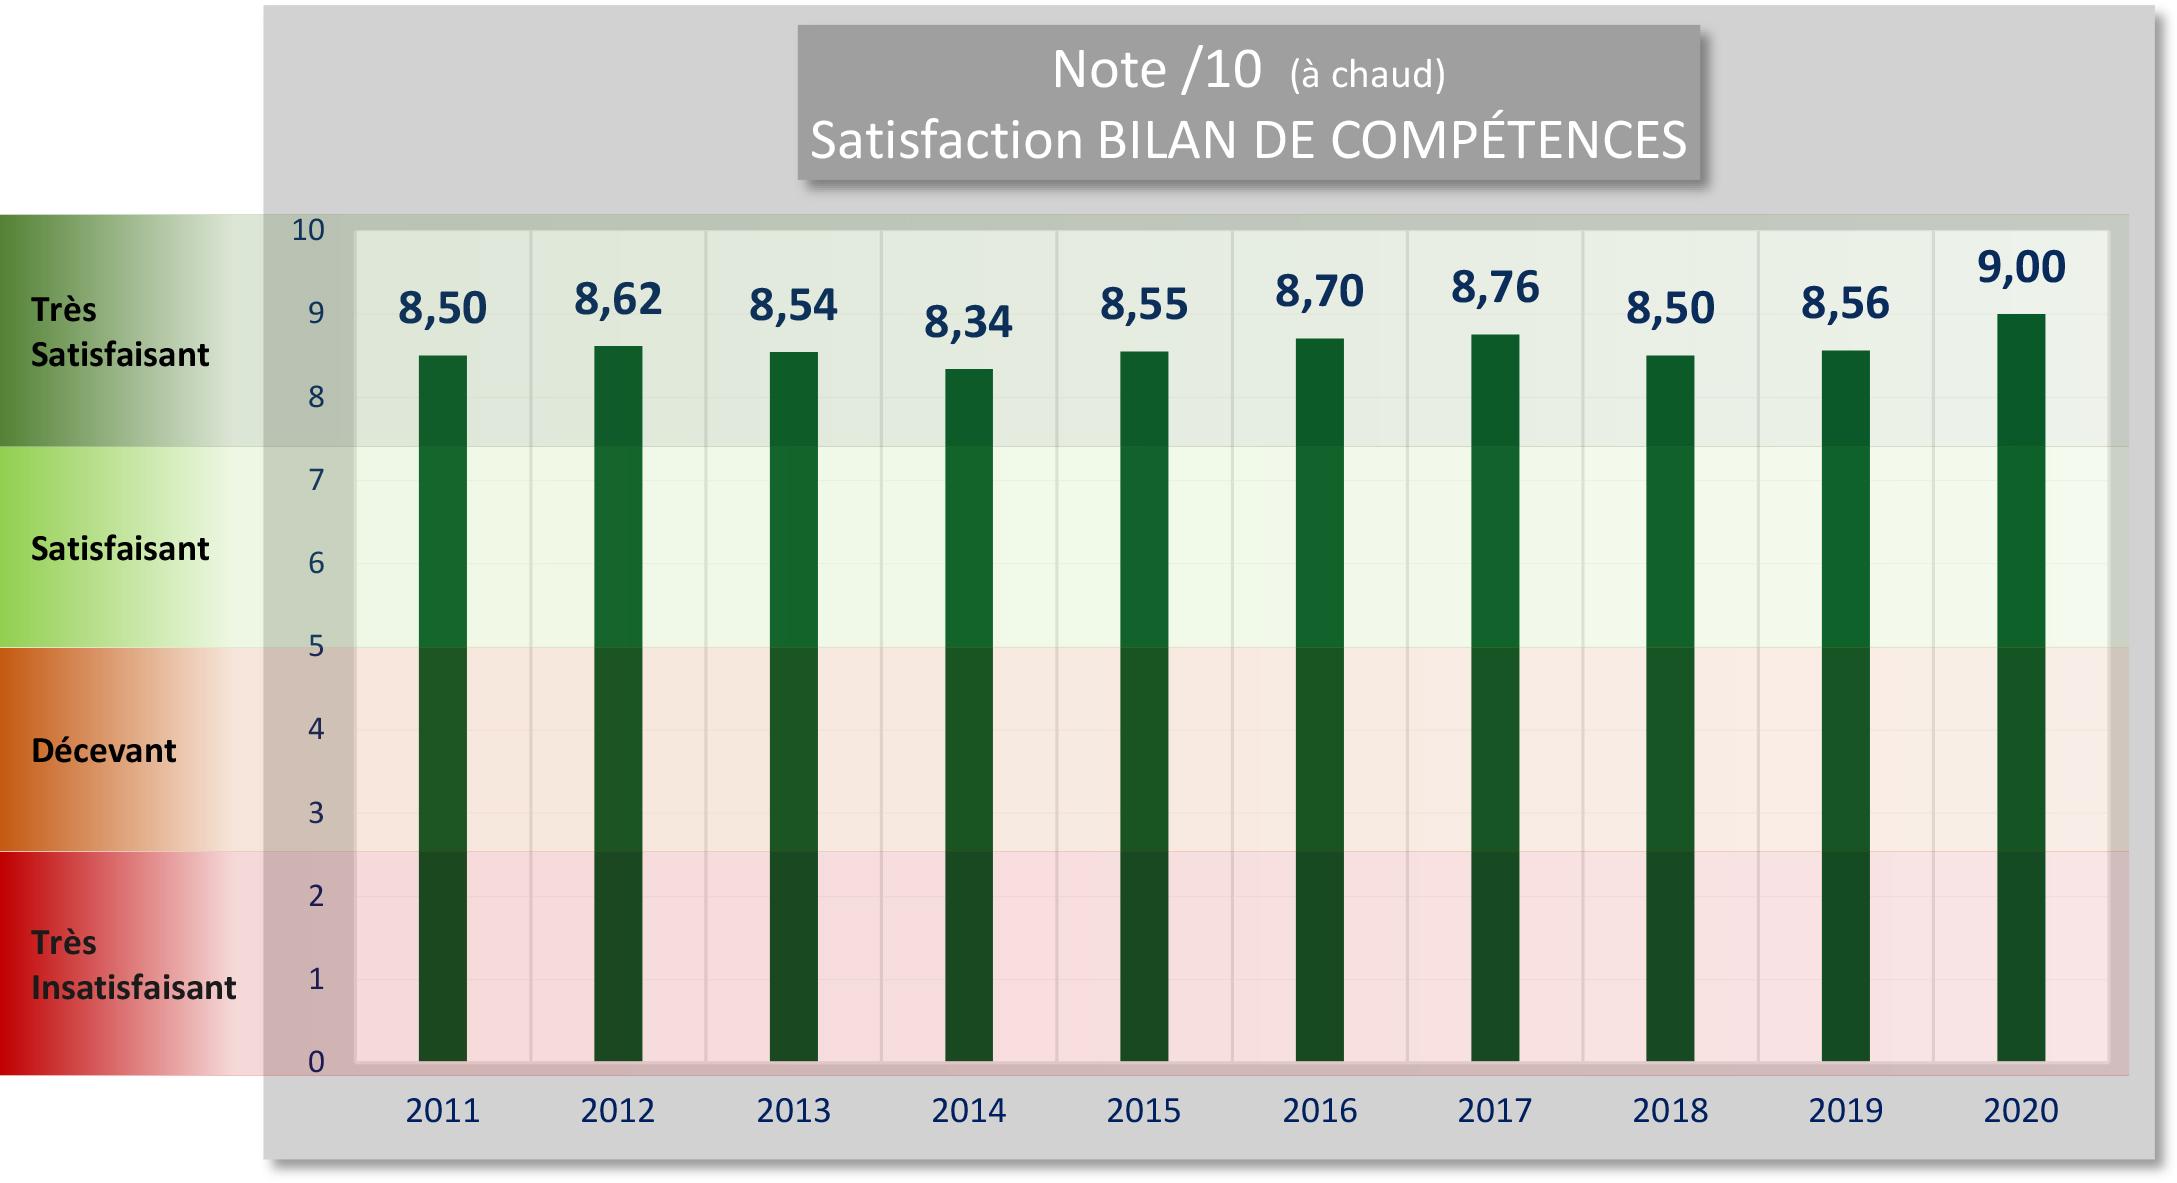 STATISTIQUES BILAN - Satisfaction à chaud